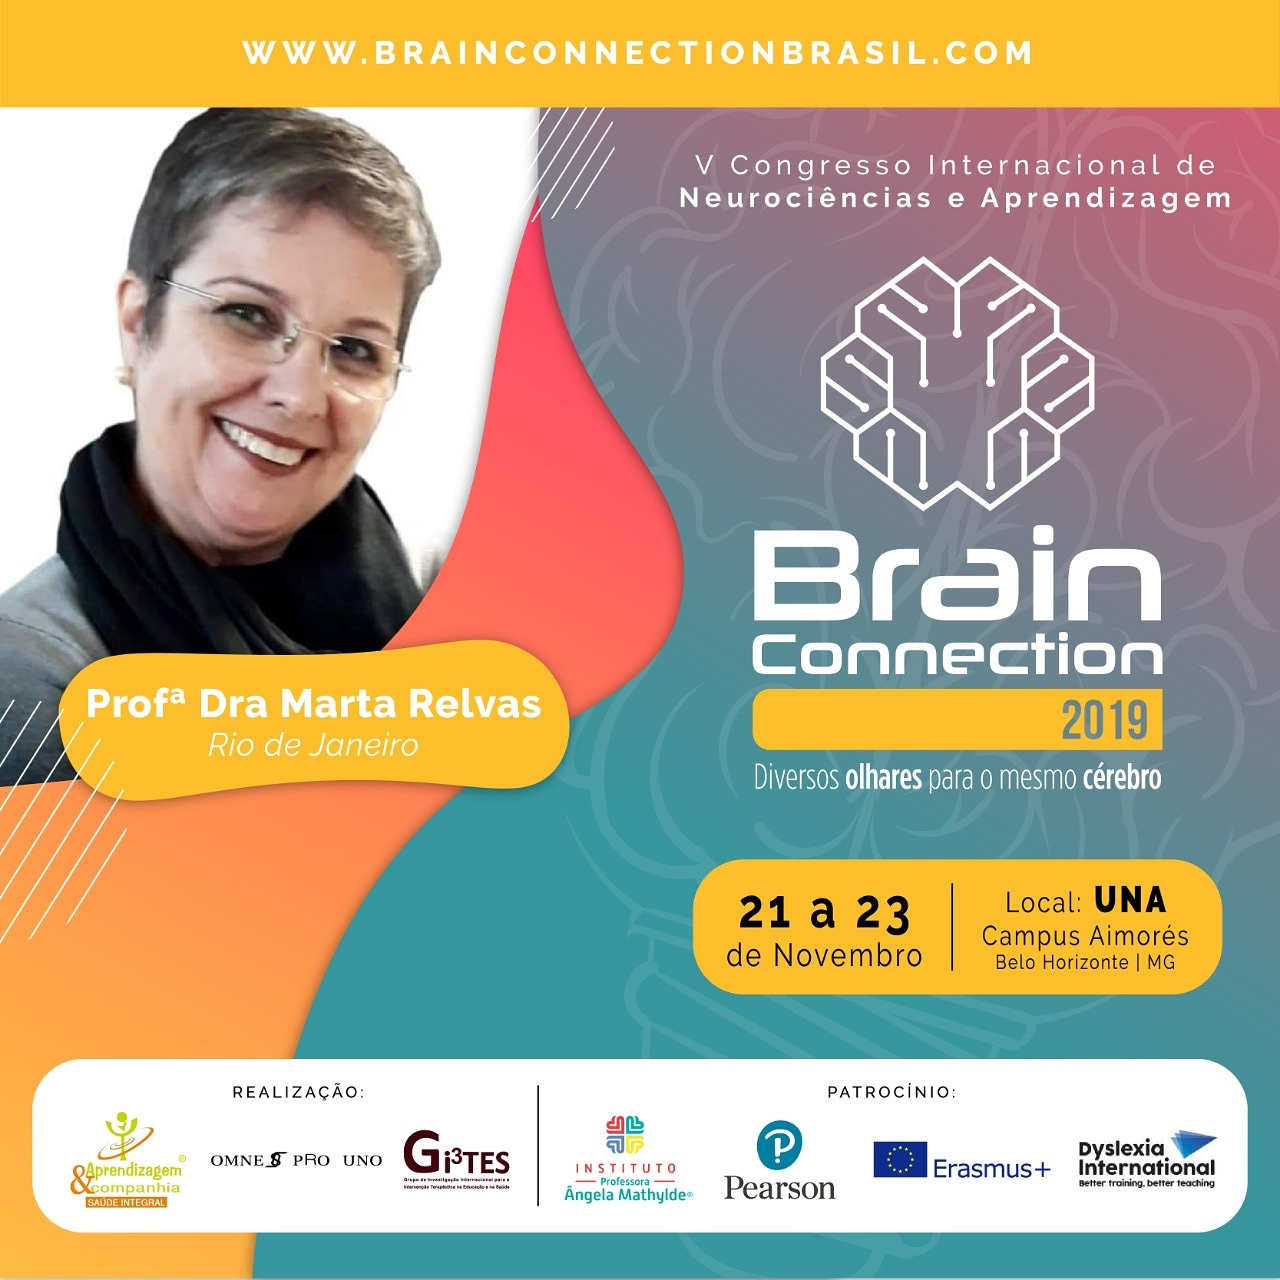 Brain Connection 2019